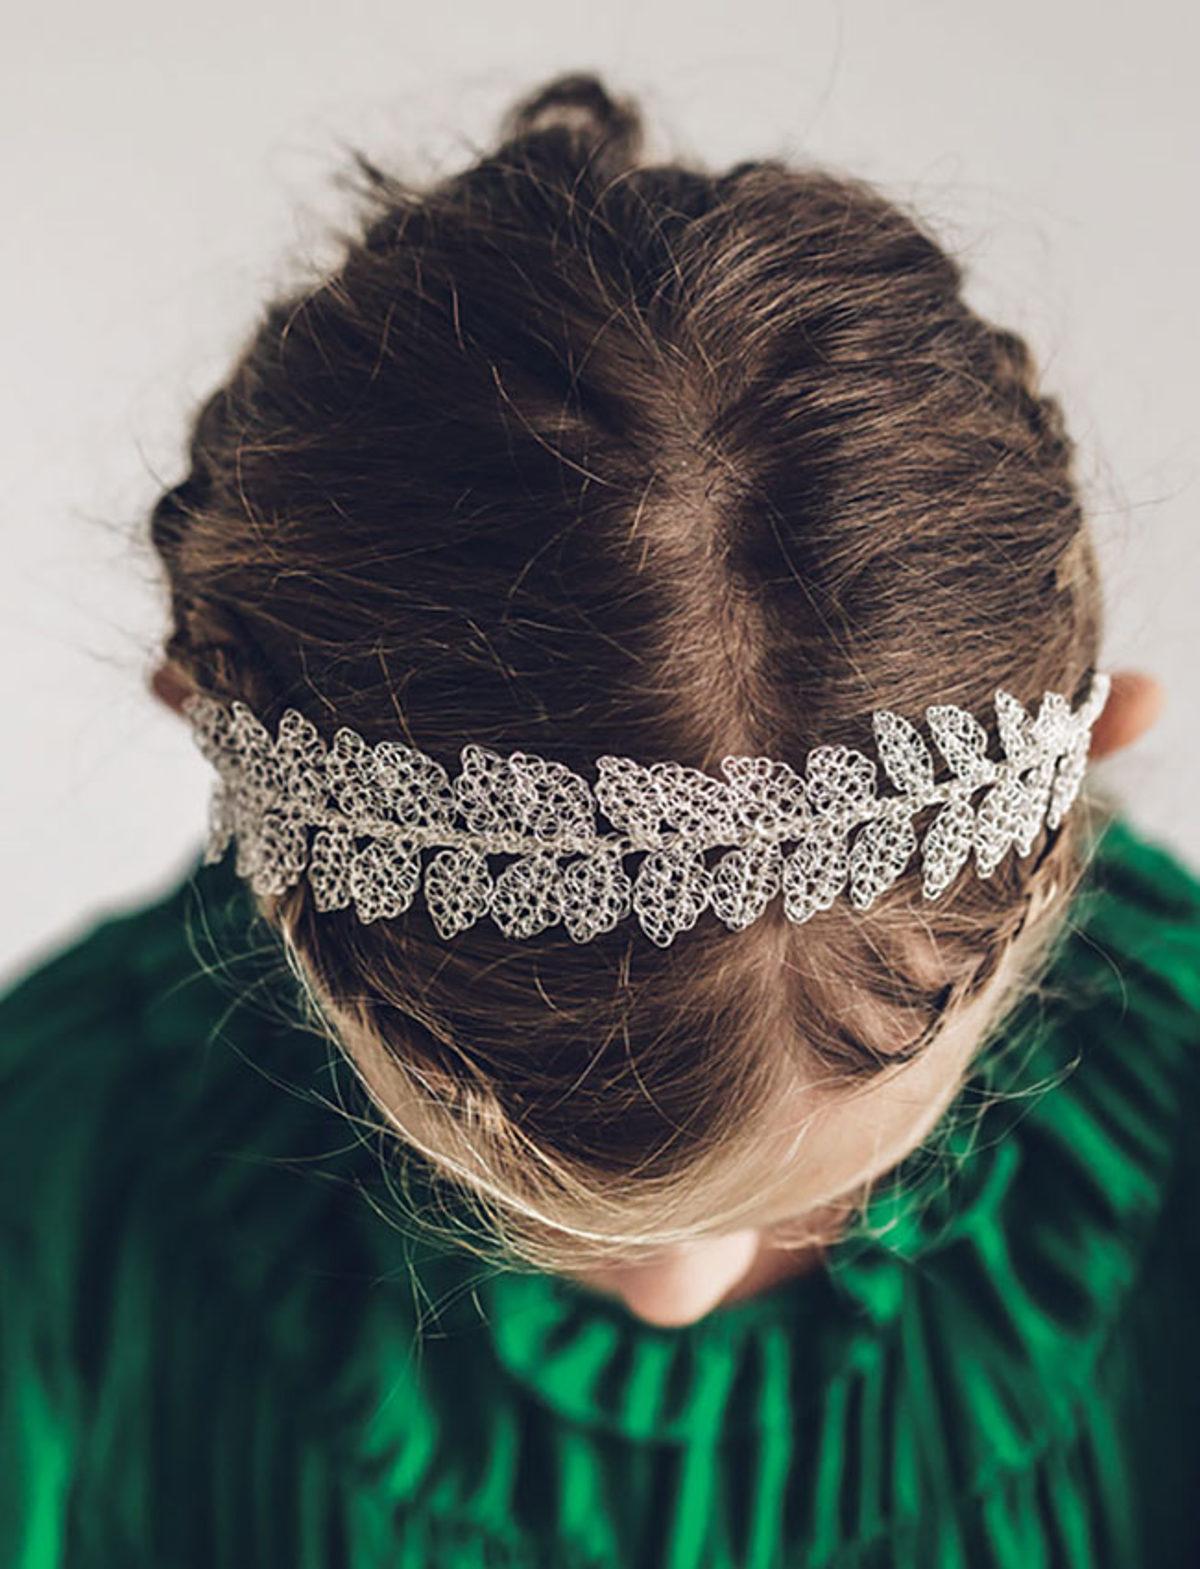 Bijoux-crochetes-fil-metallique-serre-tete